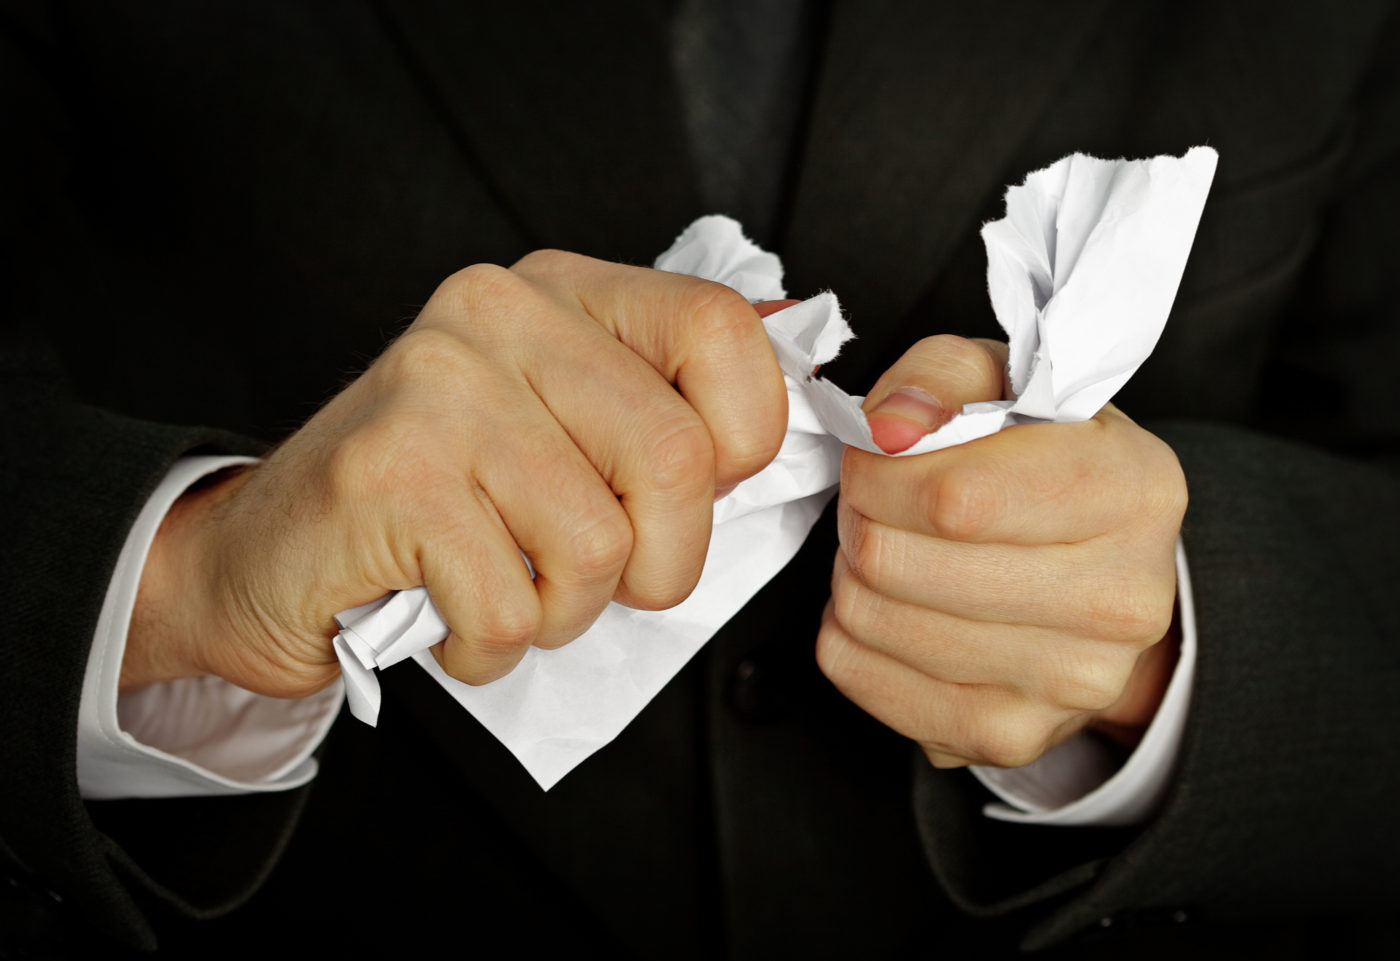 Riksrevisionen fick tummen ner av regeringen. FOTO GETTY IMAGES